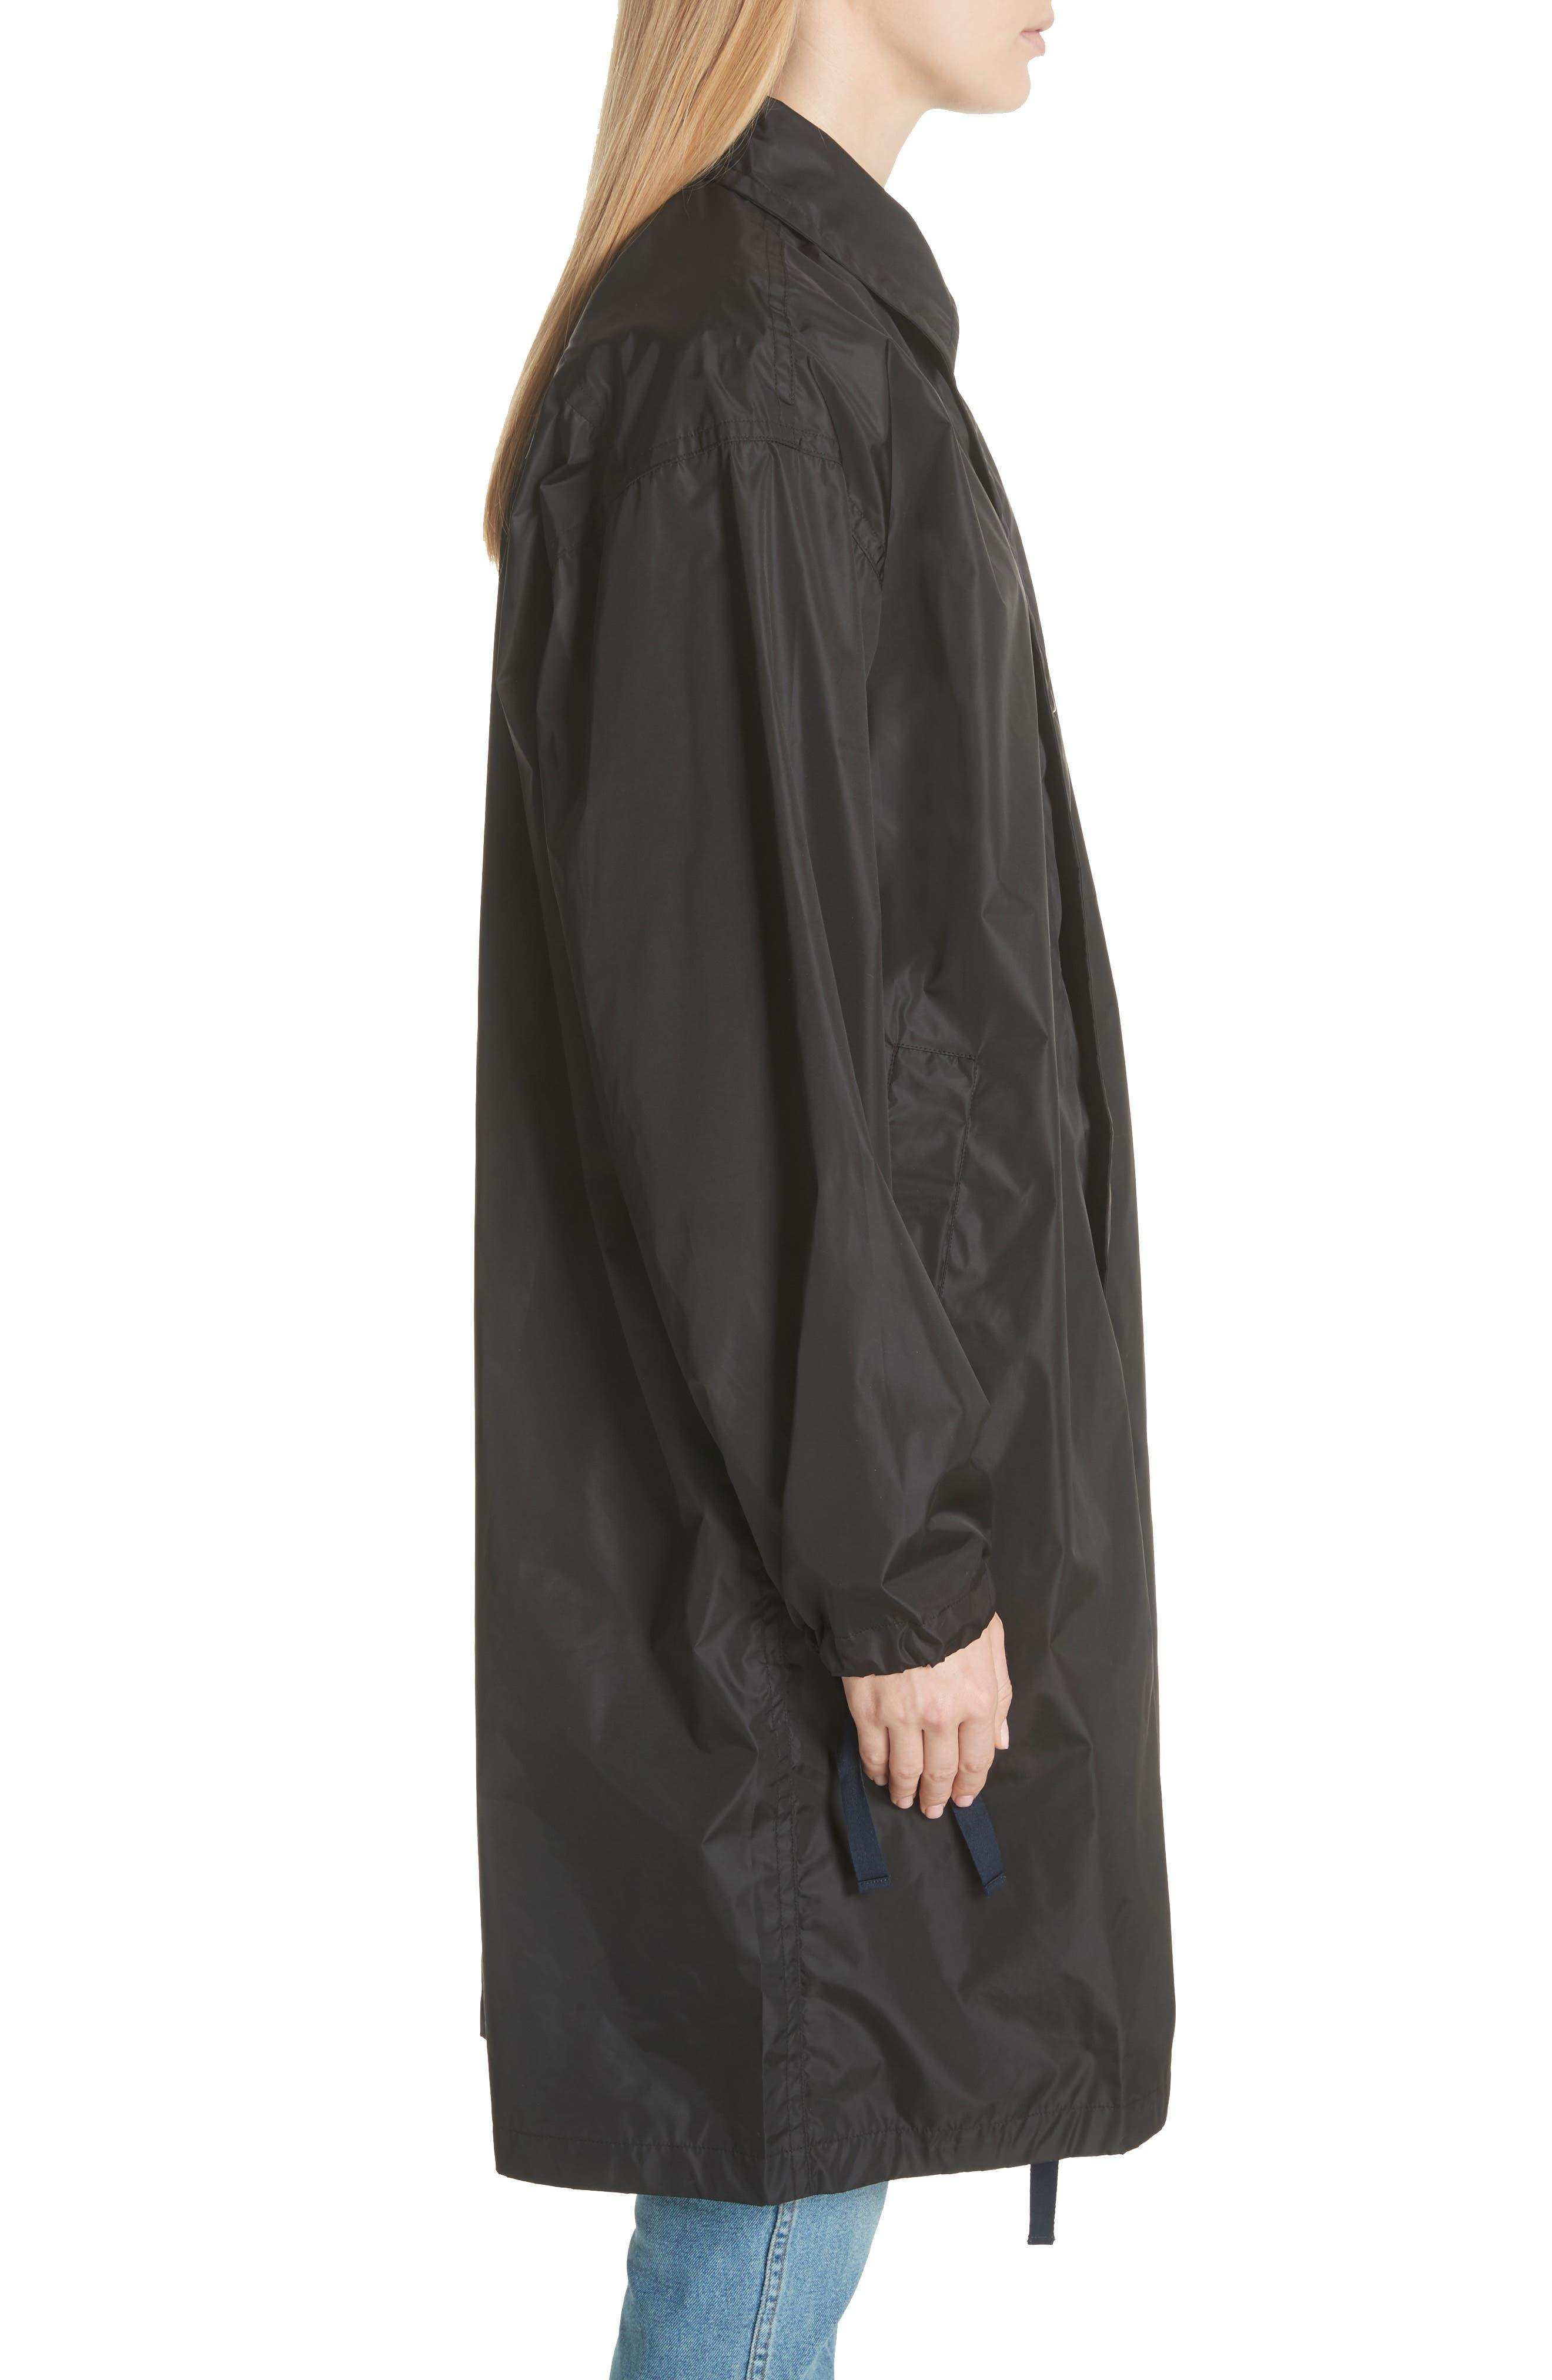 Raincoat with Inside Suspenders,                             Alternate thumbnail 4, color,                             Black